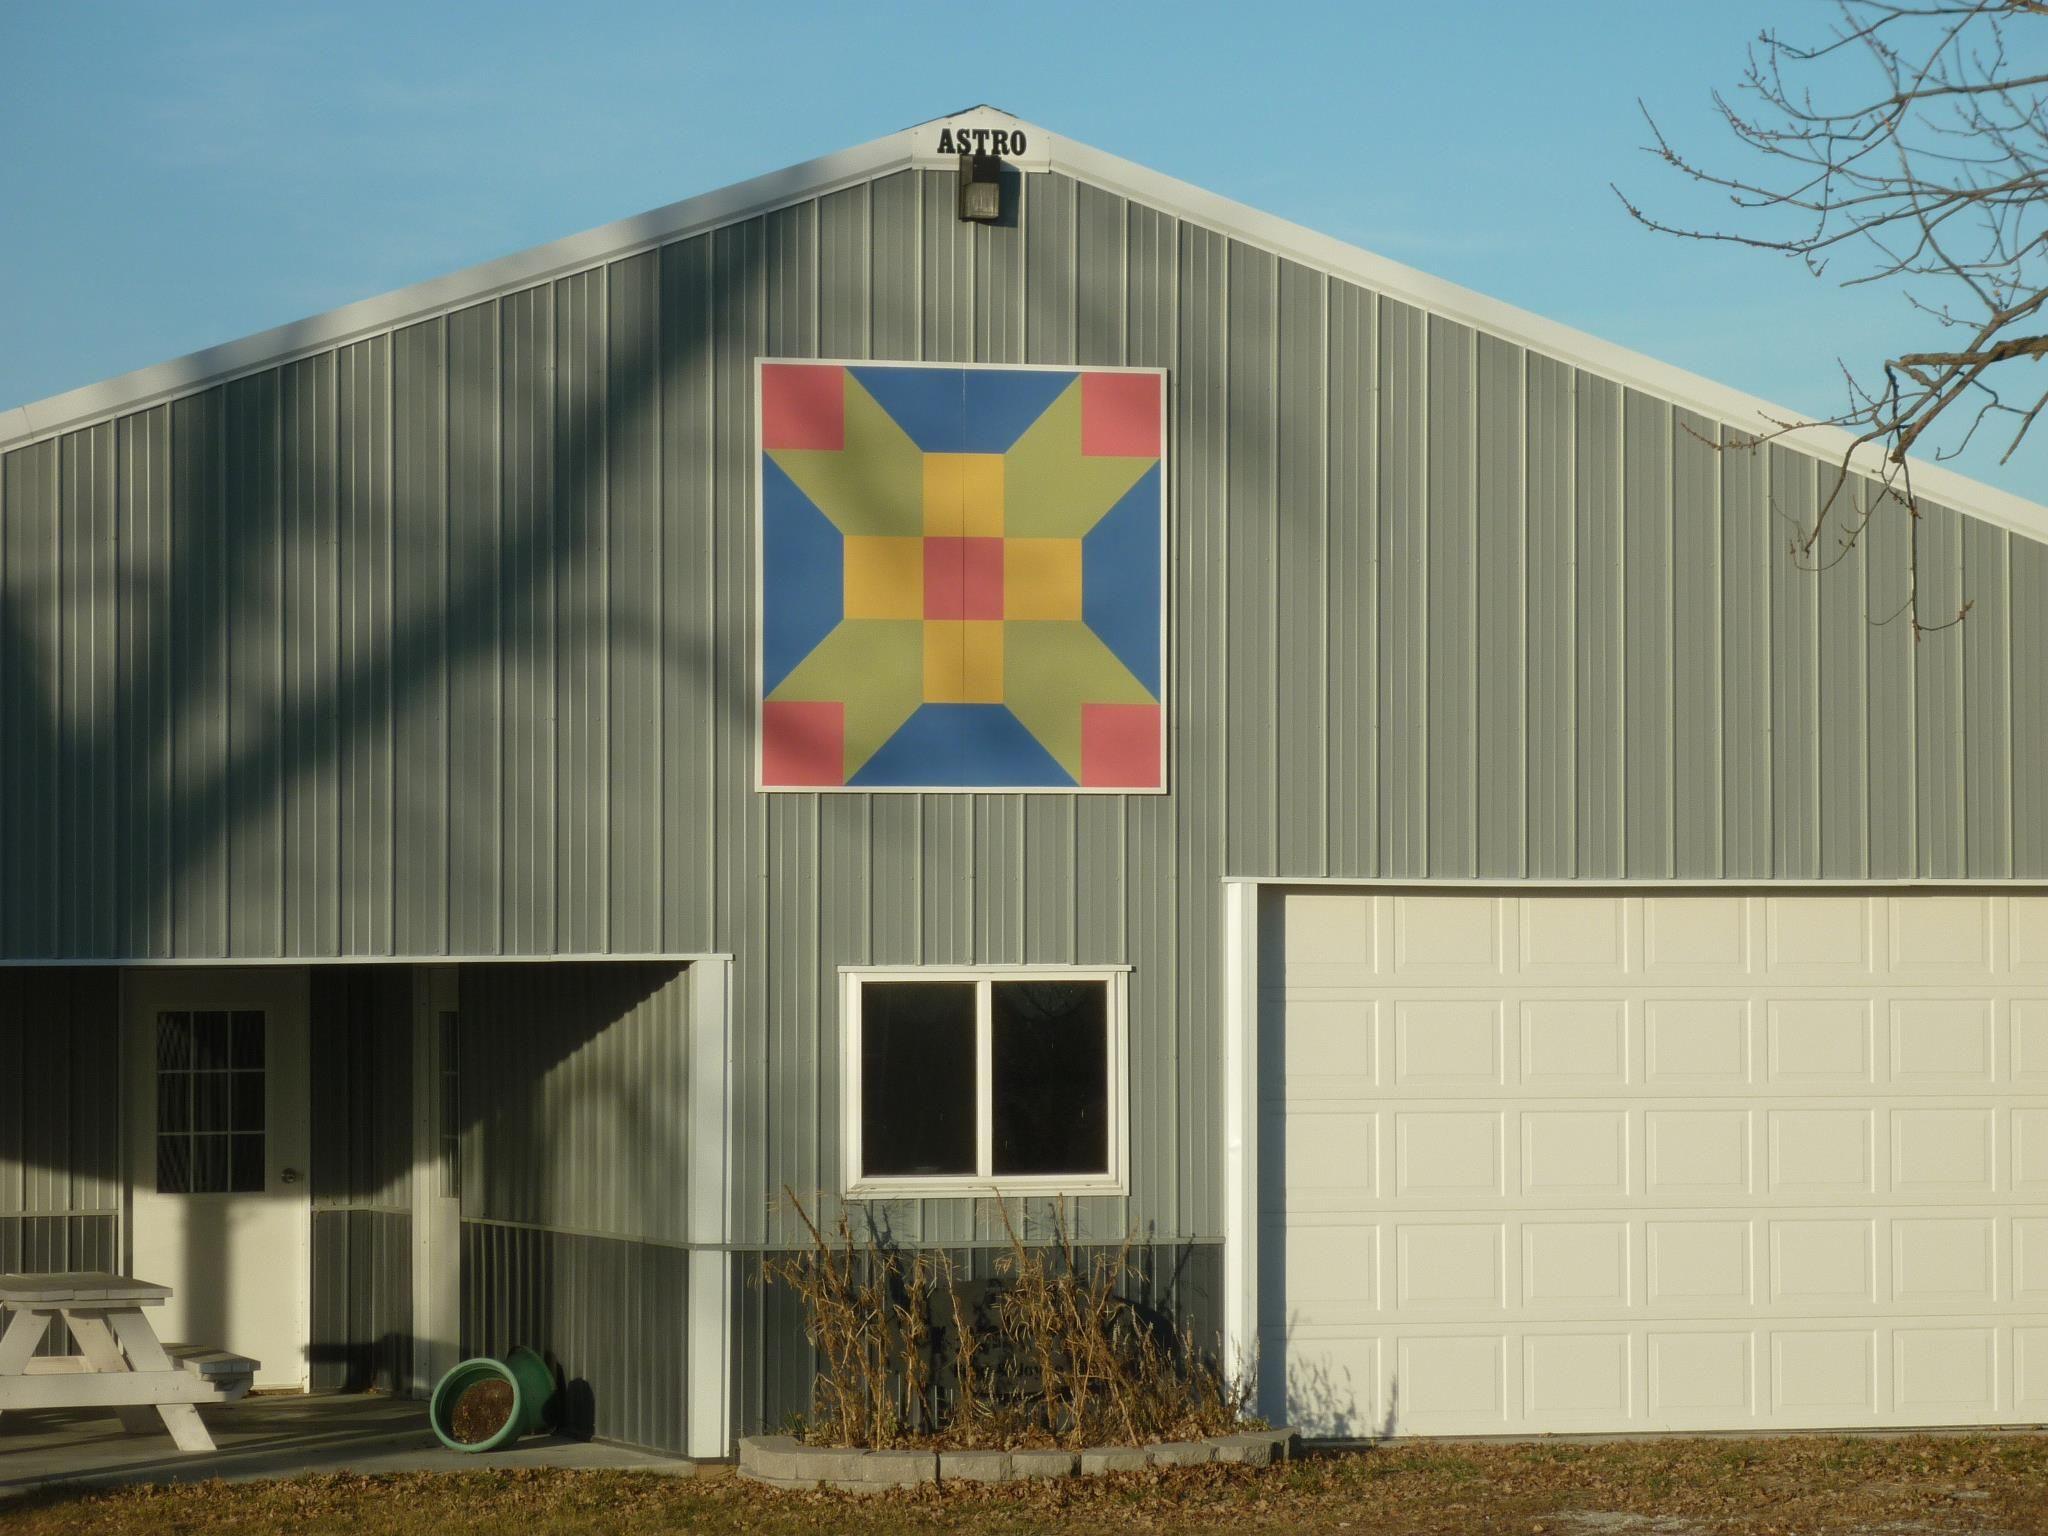 Joyce S Barn Creston Iowa Quilt Shop Barn Quilt Quilts